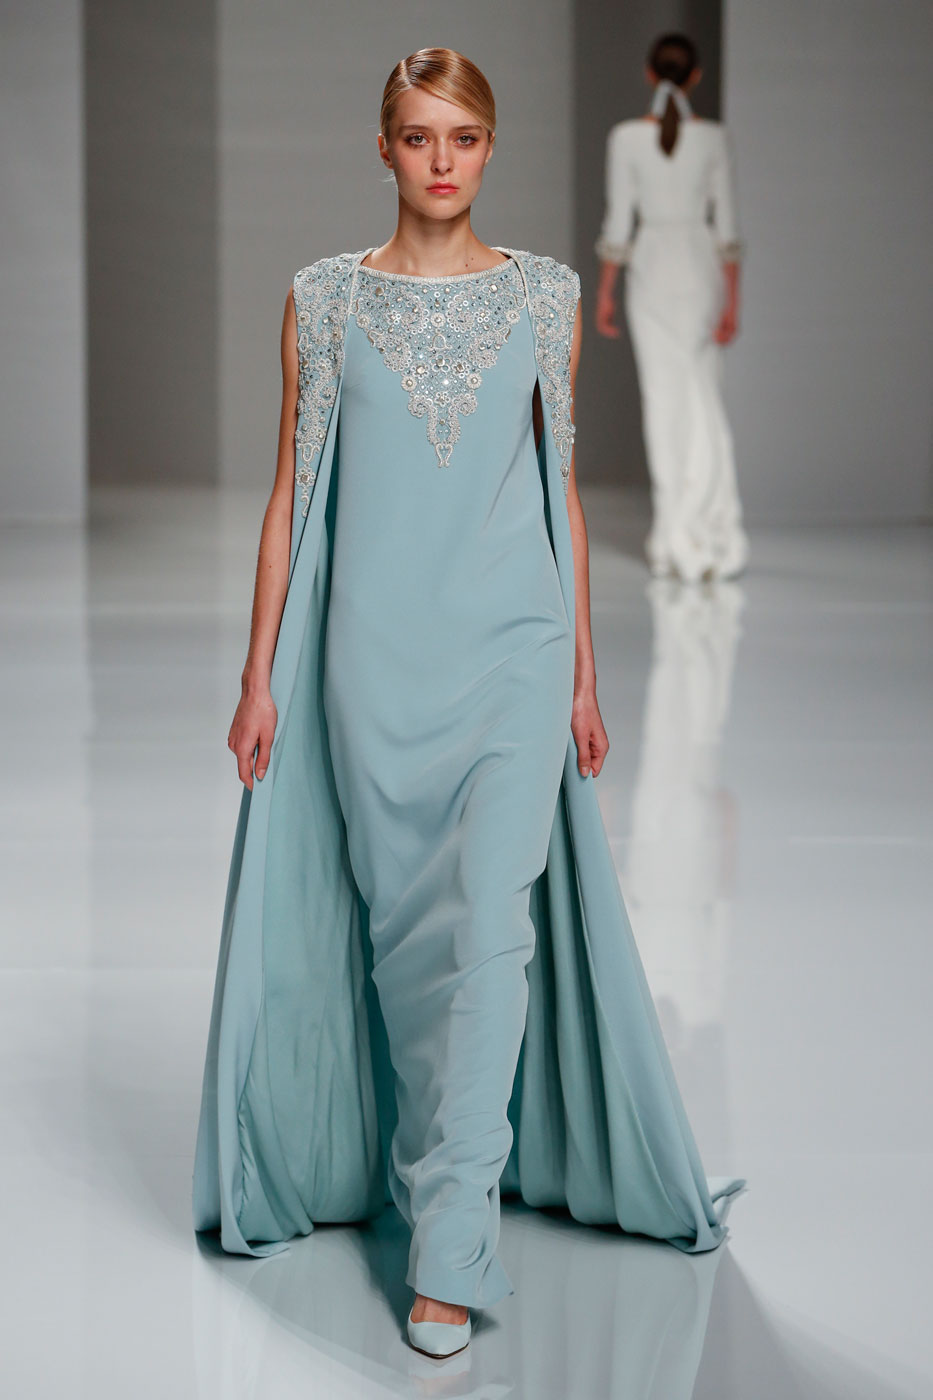 Georges-Hobeika-fashion-runway-show-haute-couture-paris-spring-2015-the-impression-37